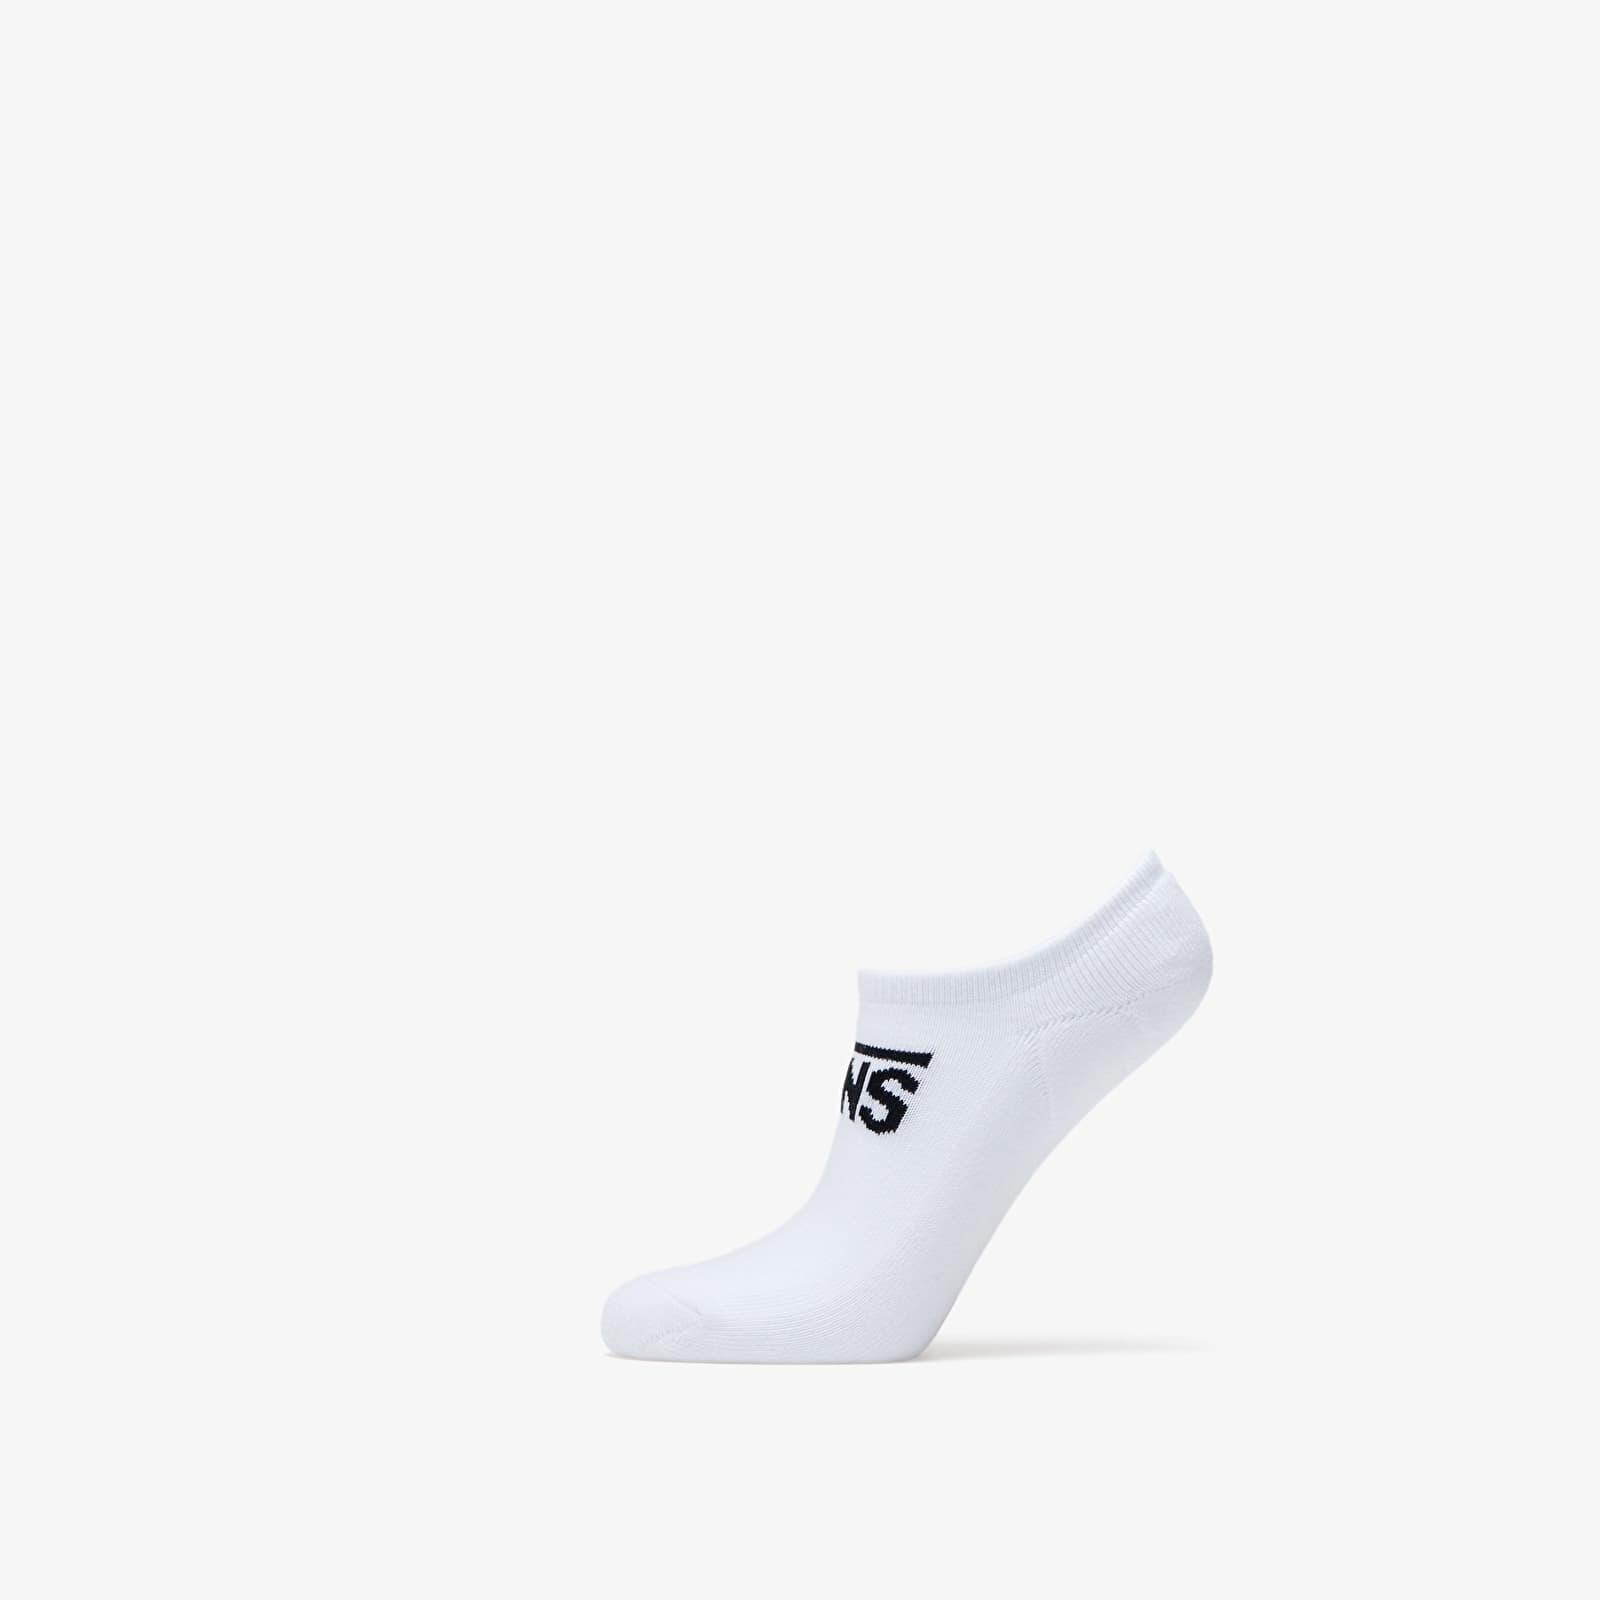 Vans Classic Kick 3 Pair Socks White EUR 42.5-47